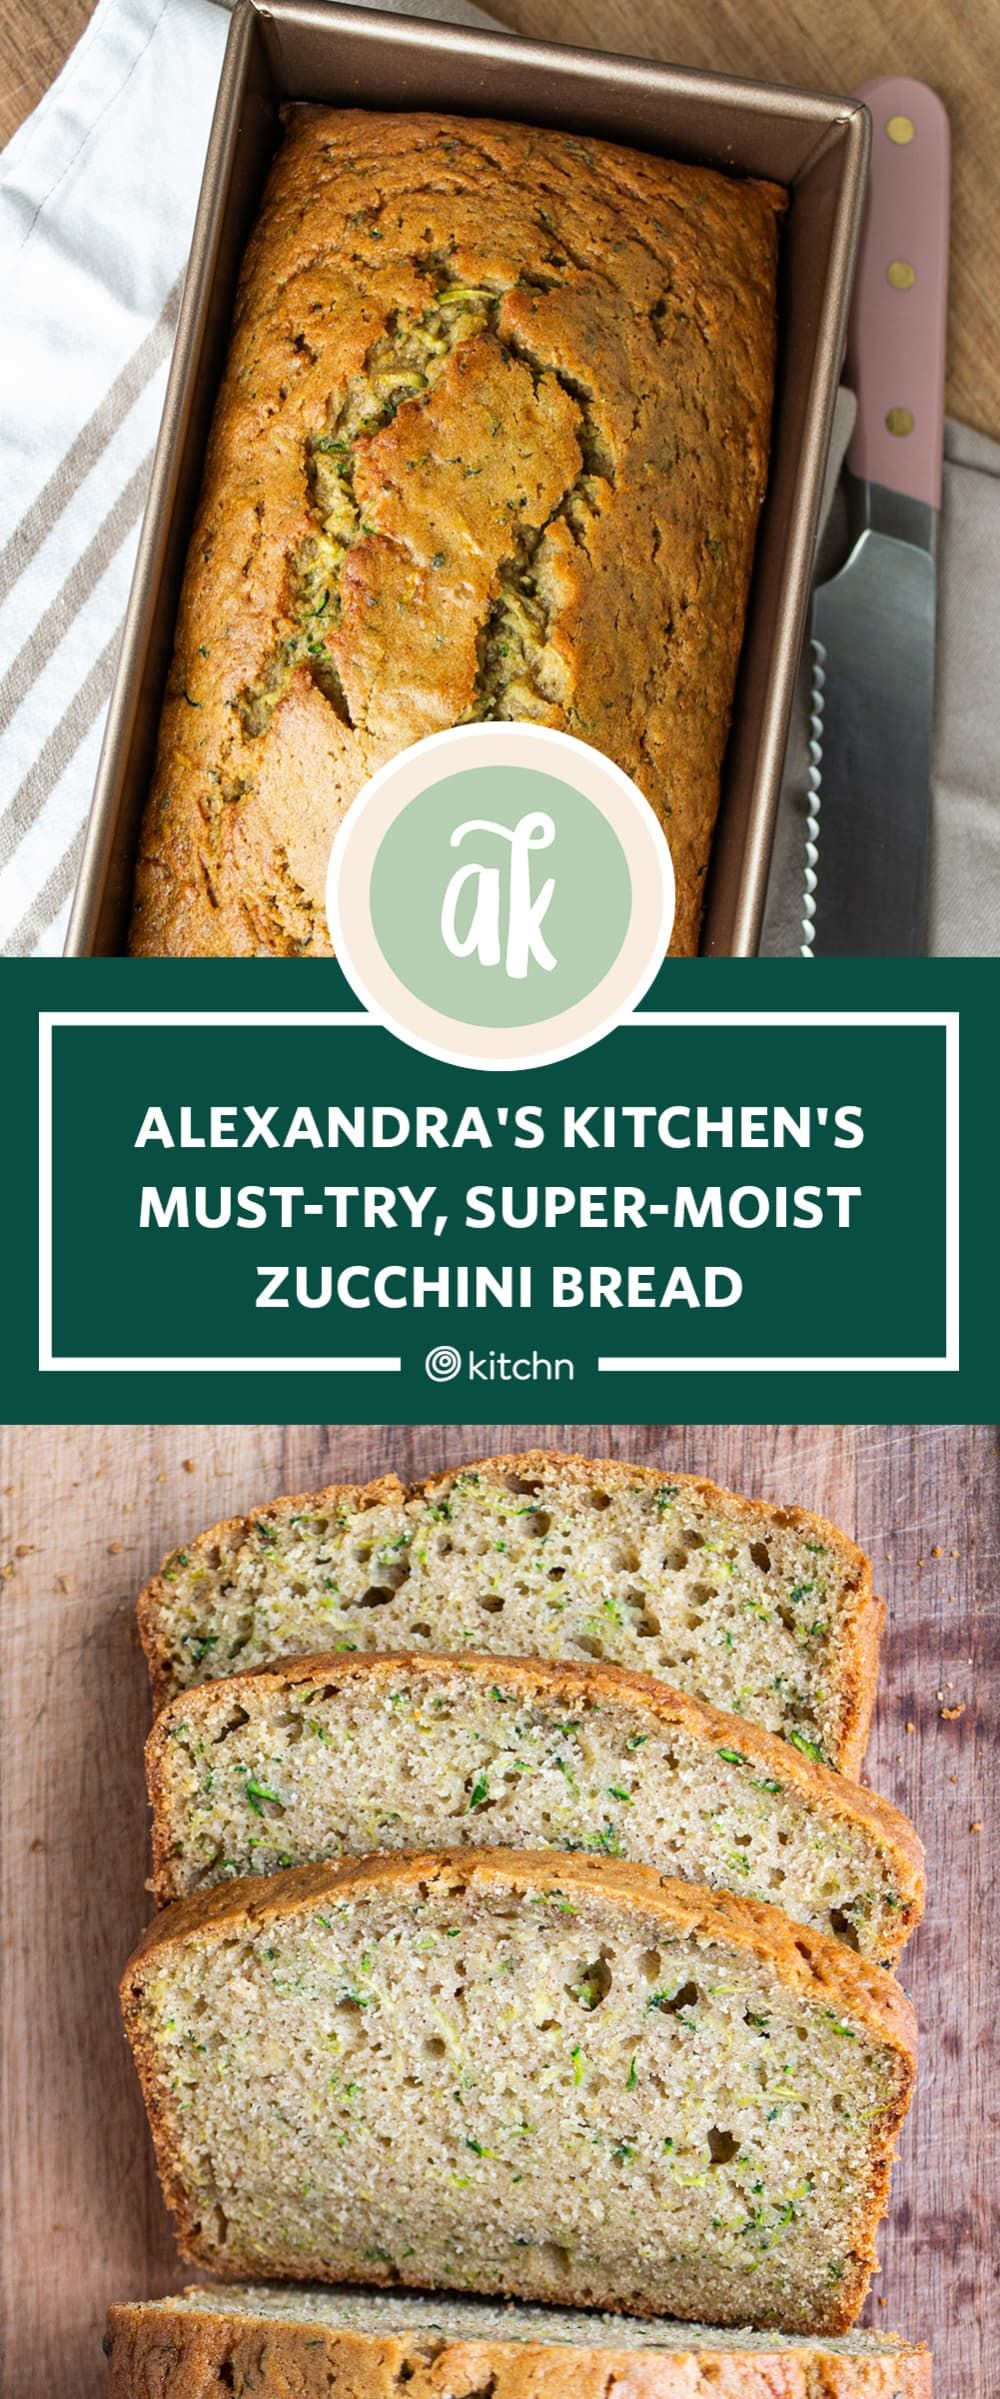 Alexandra S Kitchen S Super Moist Zucchini Bread Recipe Is A Total Game Changer In 2020 Zucchini Bread Recipes Moist Zucchini Bread Recipes